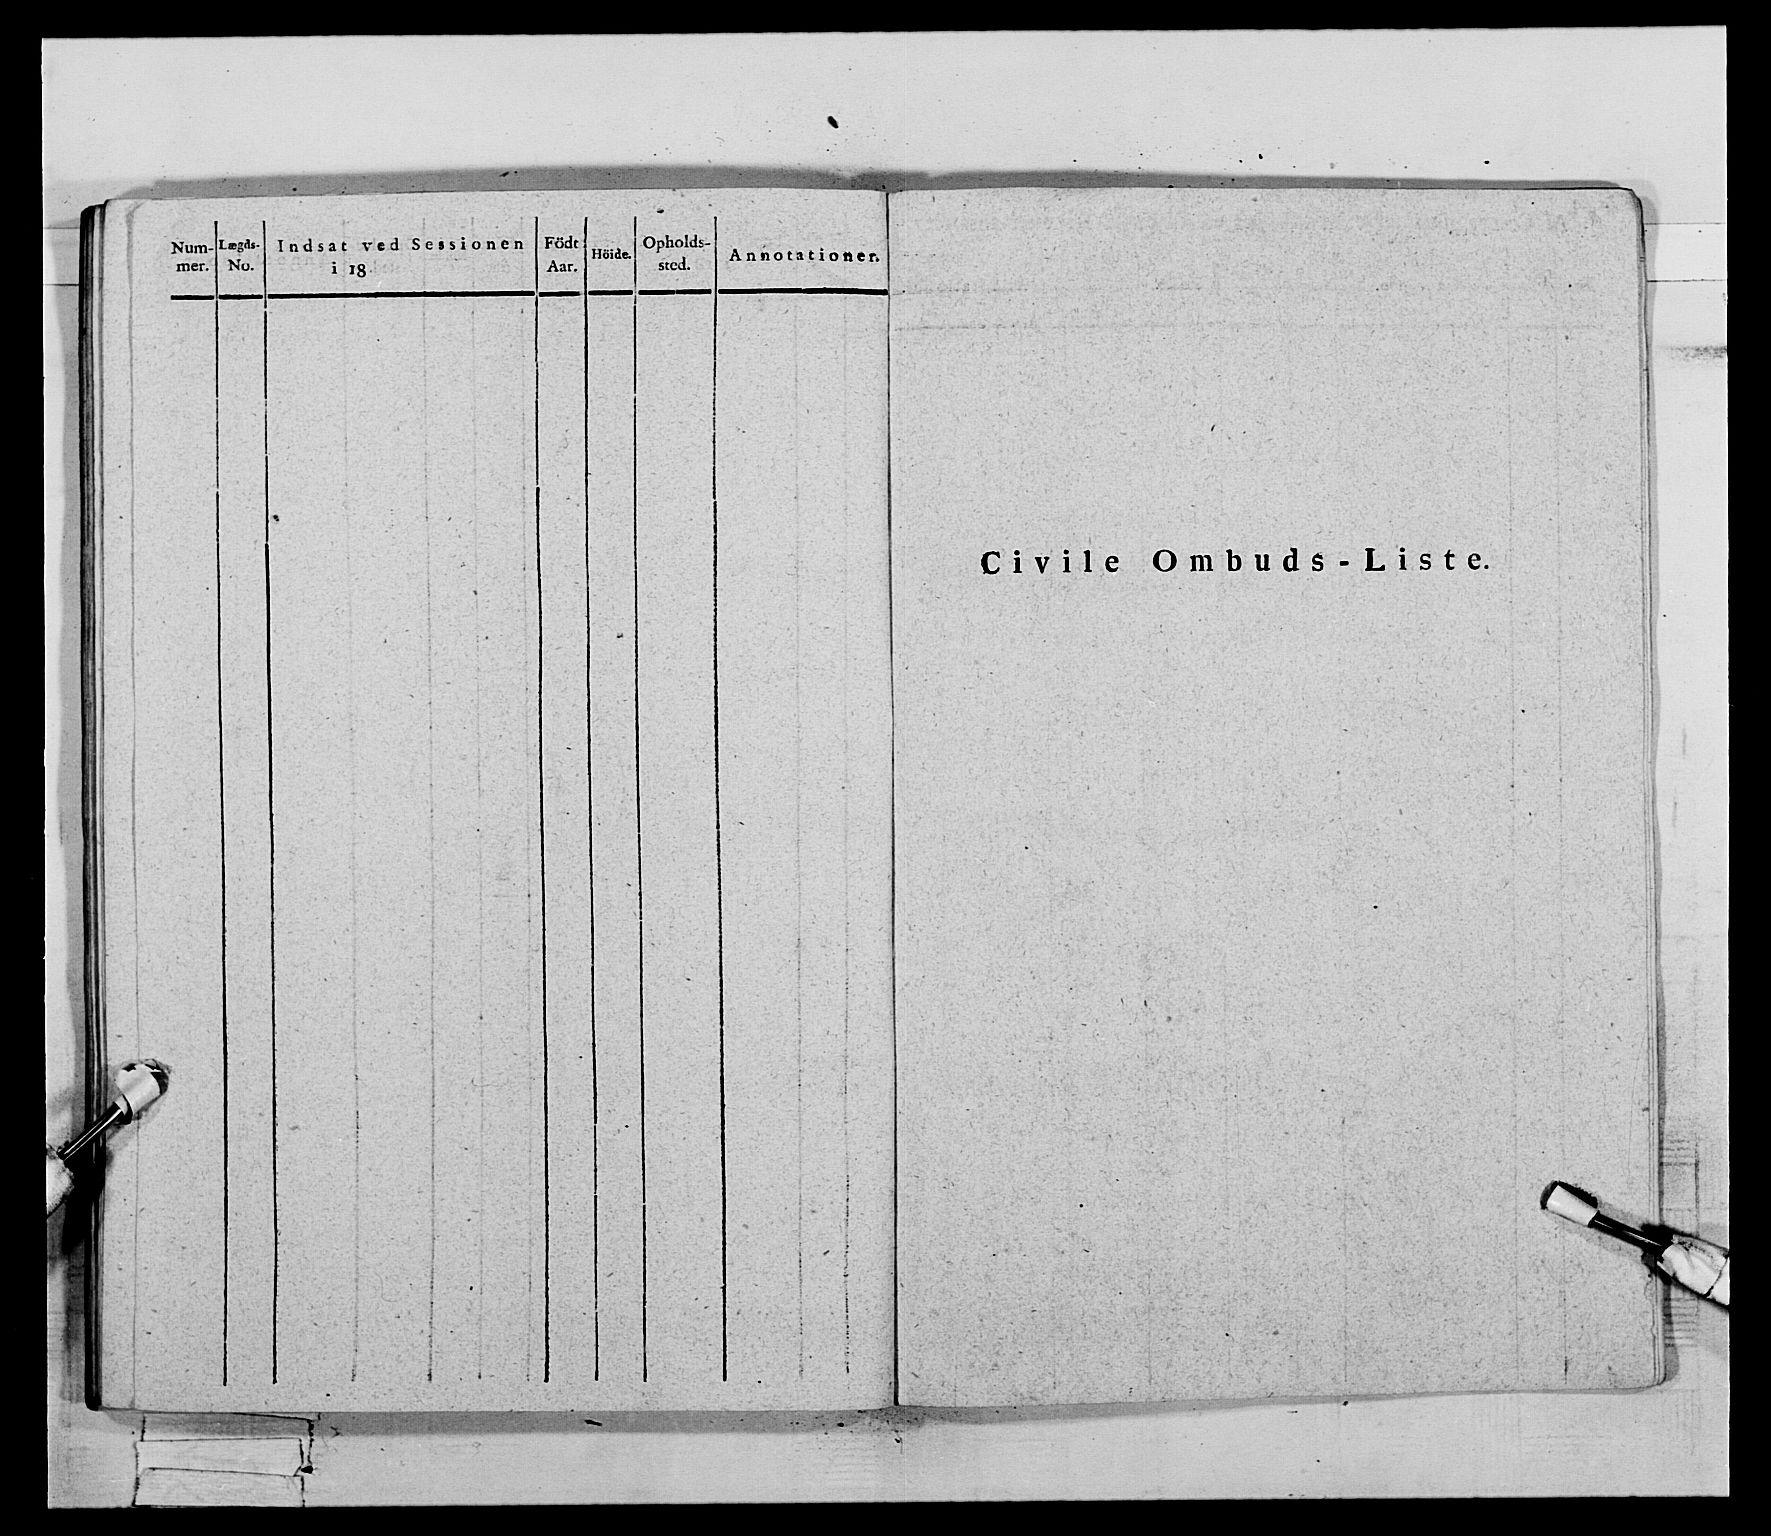 RA, Generalitets- og kommissariatskollegiet, Det kongelige norske kommissariatskollegium, E/Eh/L0069: Opplandske gevorbne infanteriregiment, 1810-1818, s. 464